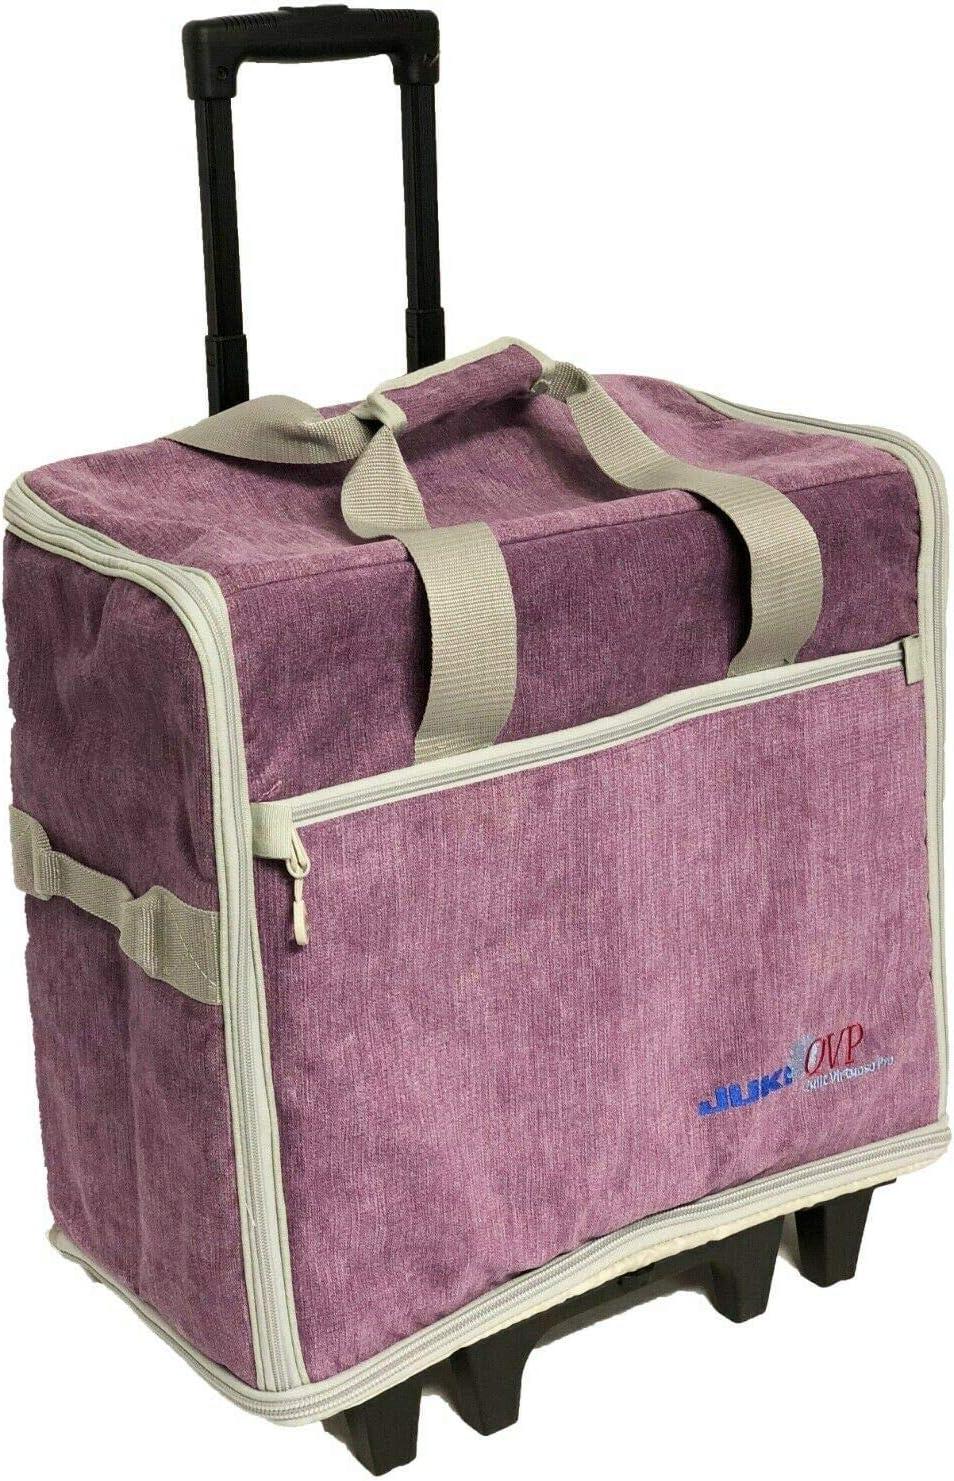 Juki QVP Sewing Machine Tote Travel Trolley Bag 19-Inch